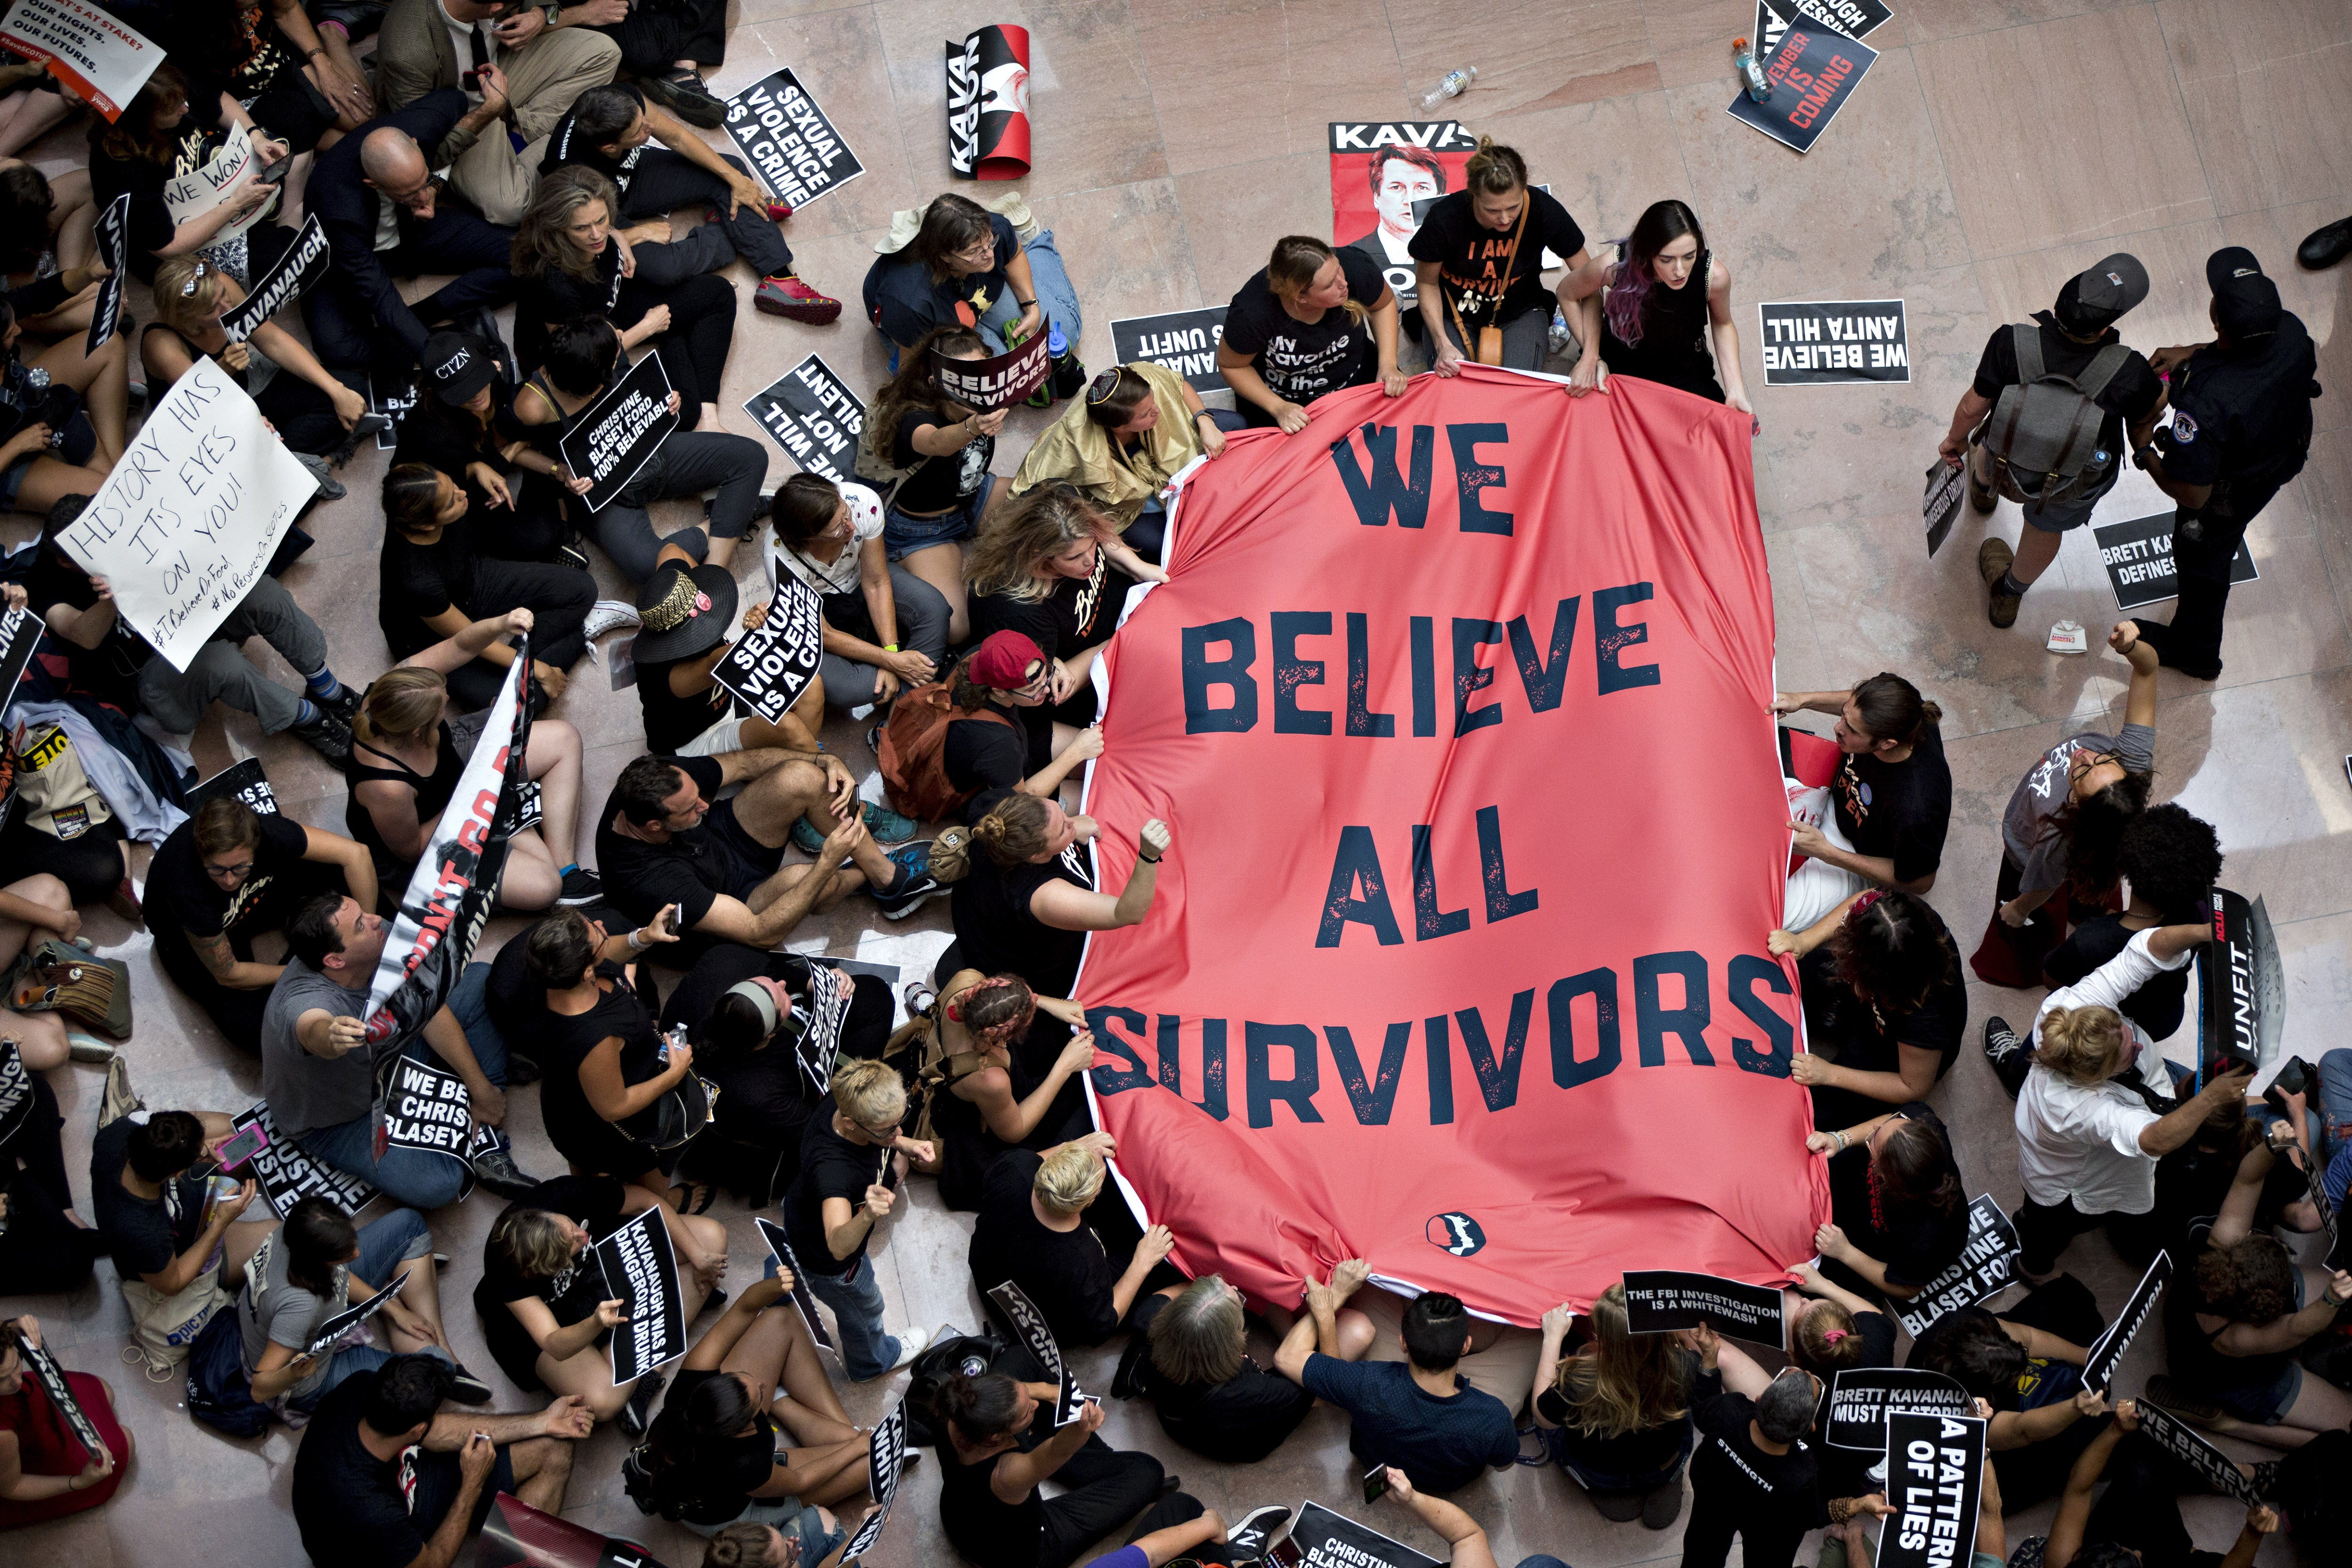 BrettKavanaugh.com Is Now A Resource For Sexual Assault Survivors